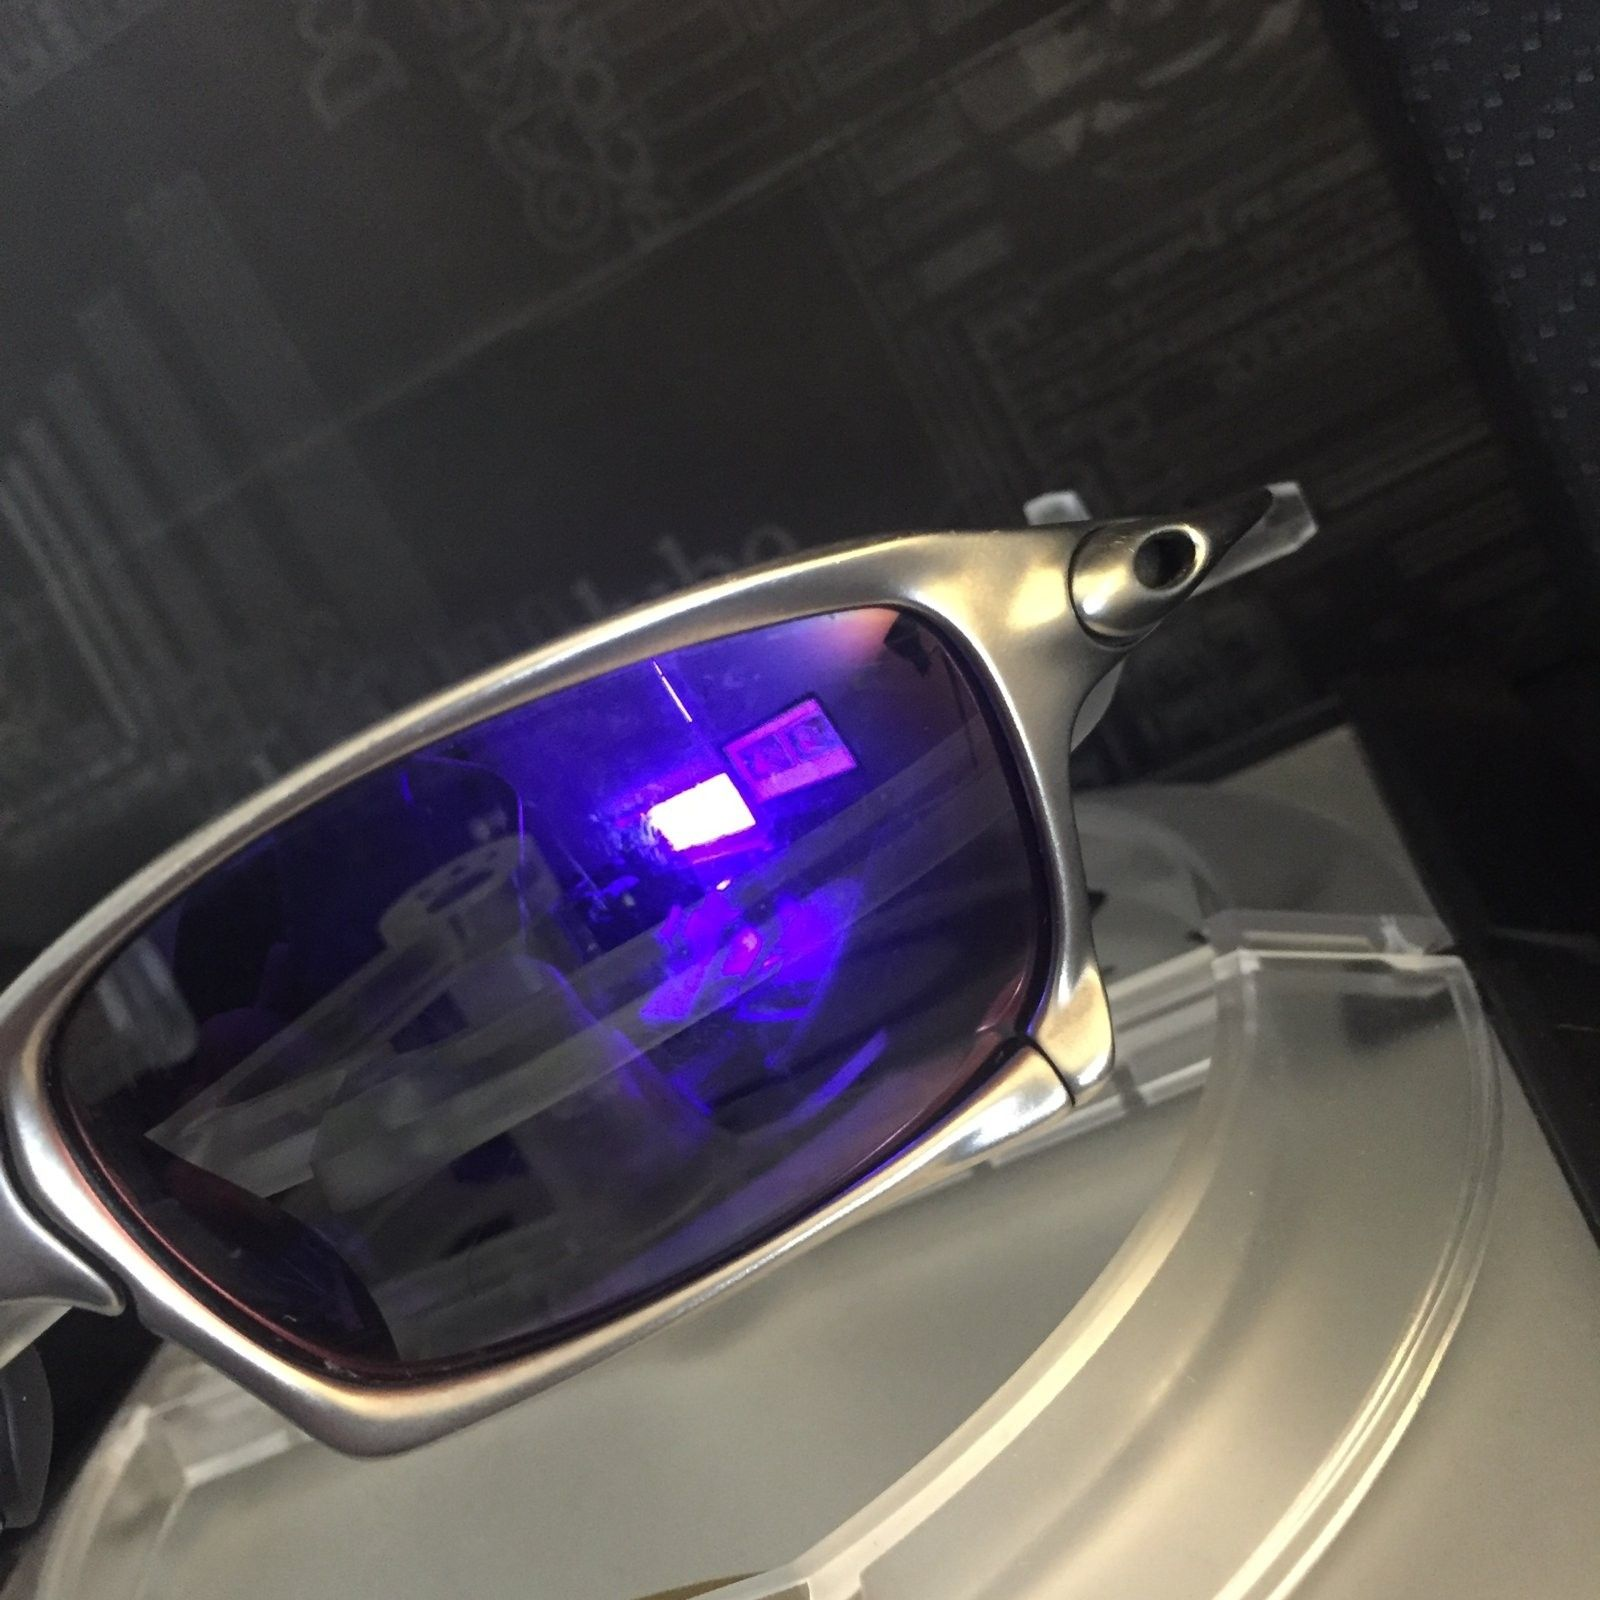 x-squared plasma only $350.00 - IMG_4817.JPG